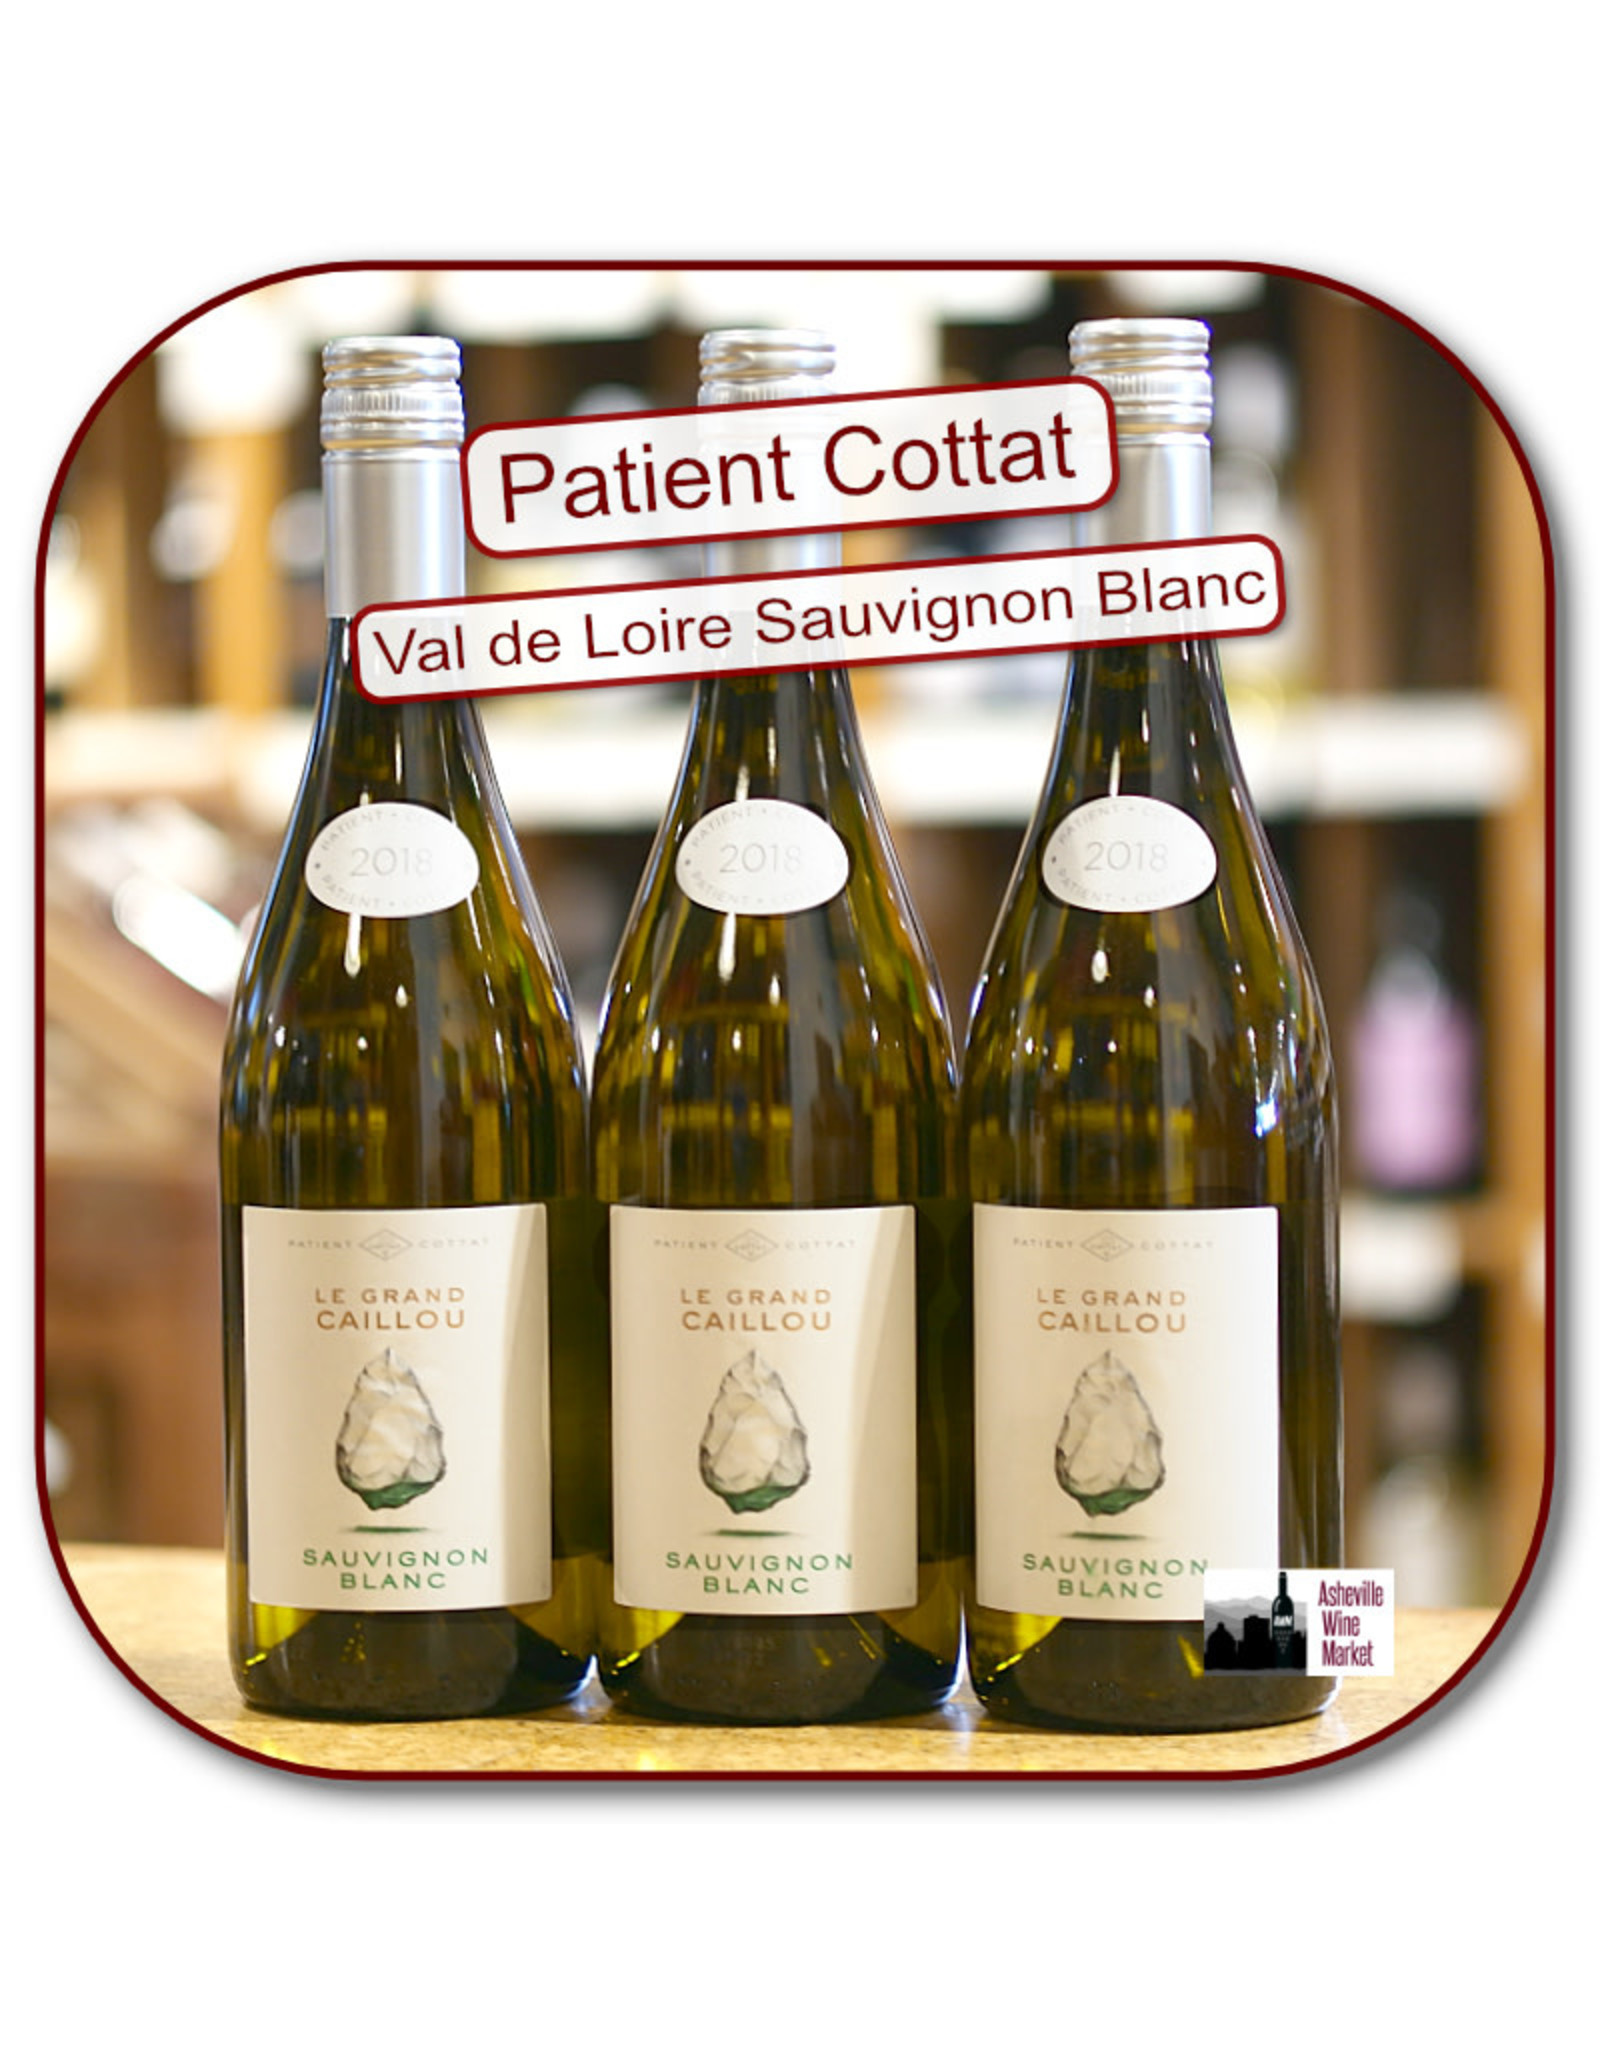 Sauvignon Blanc Patient Cottat Loire Sauvignon Blanc Grand Caillou 19